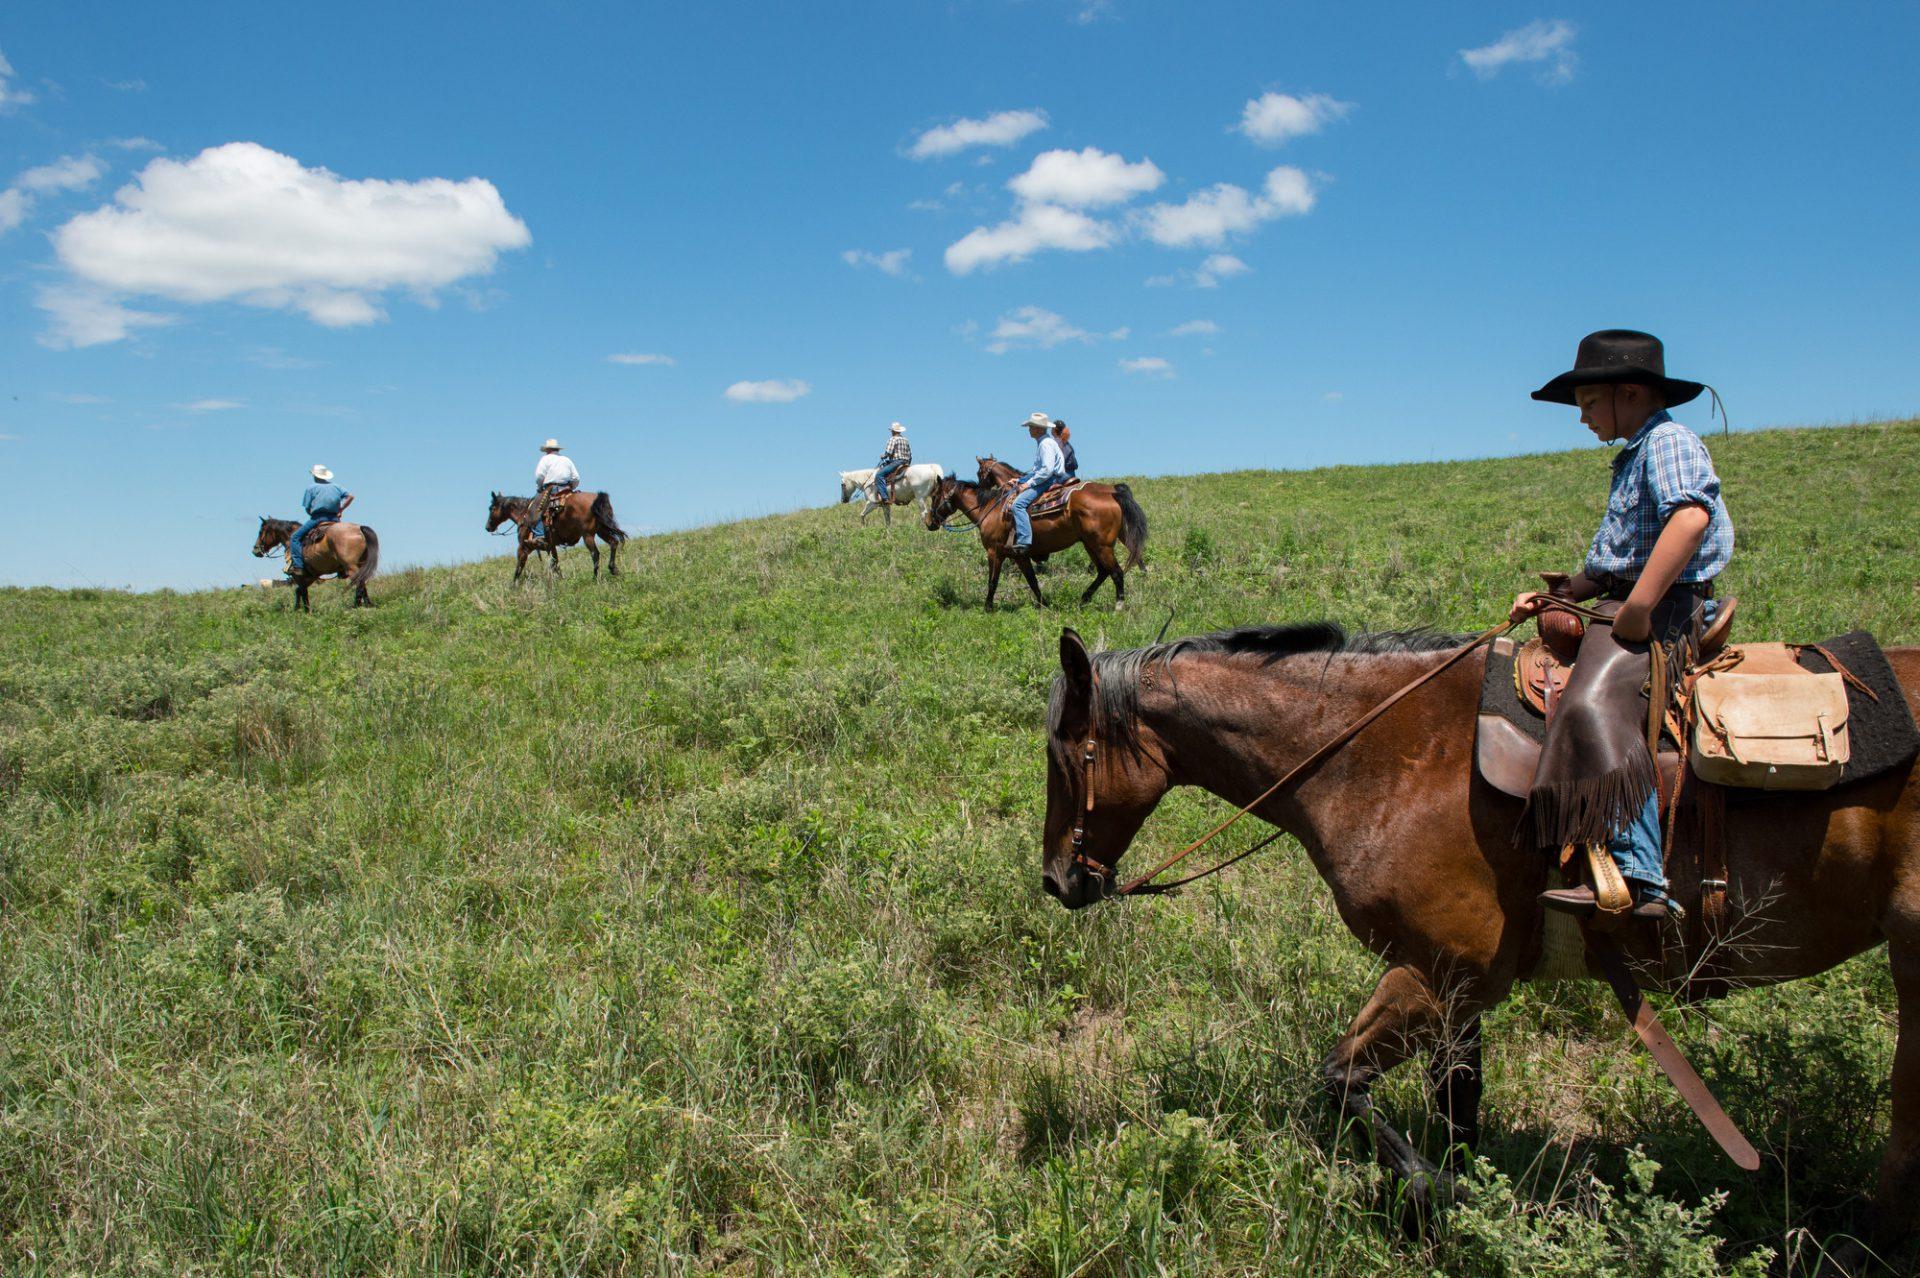 Photo: Ranchers ride horses through a field.